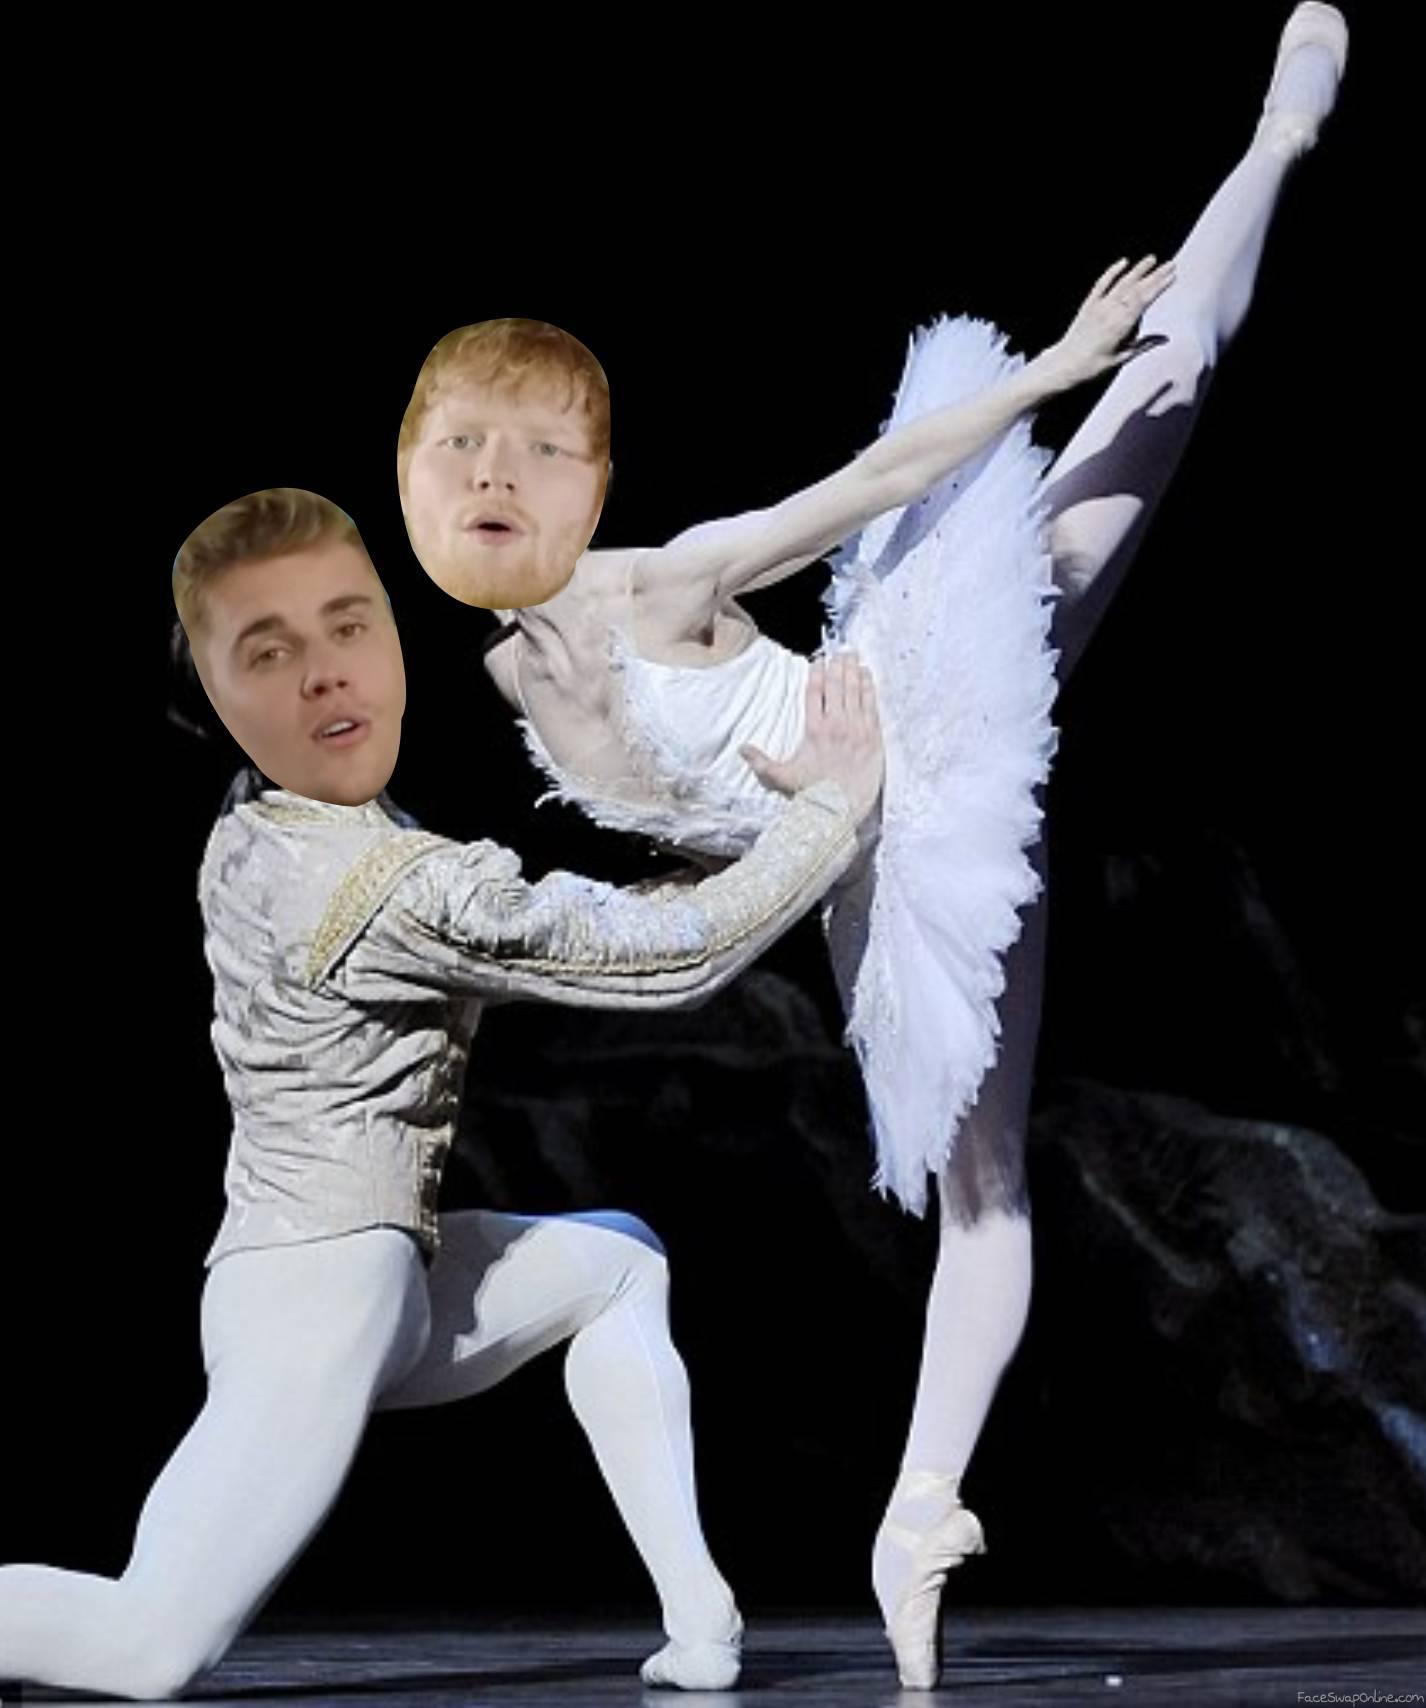 Ed Sheeran & Justin Bieber ballerina gay meme